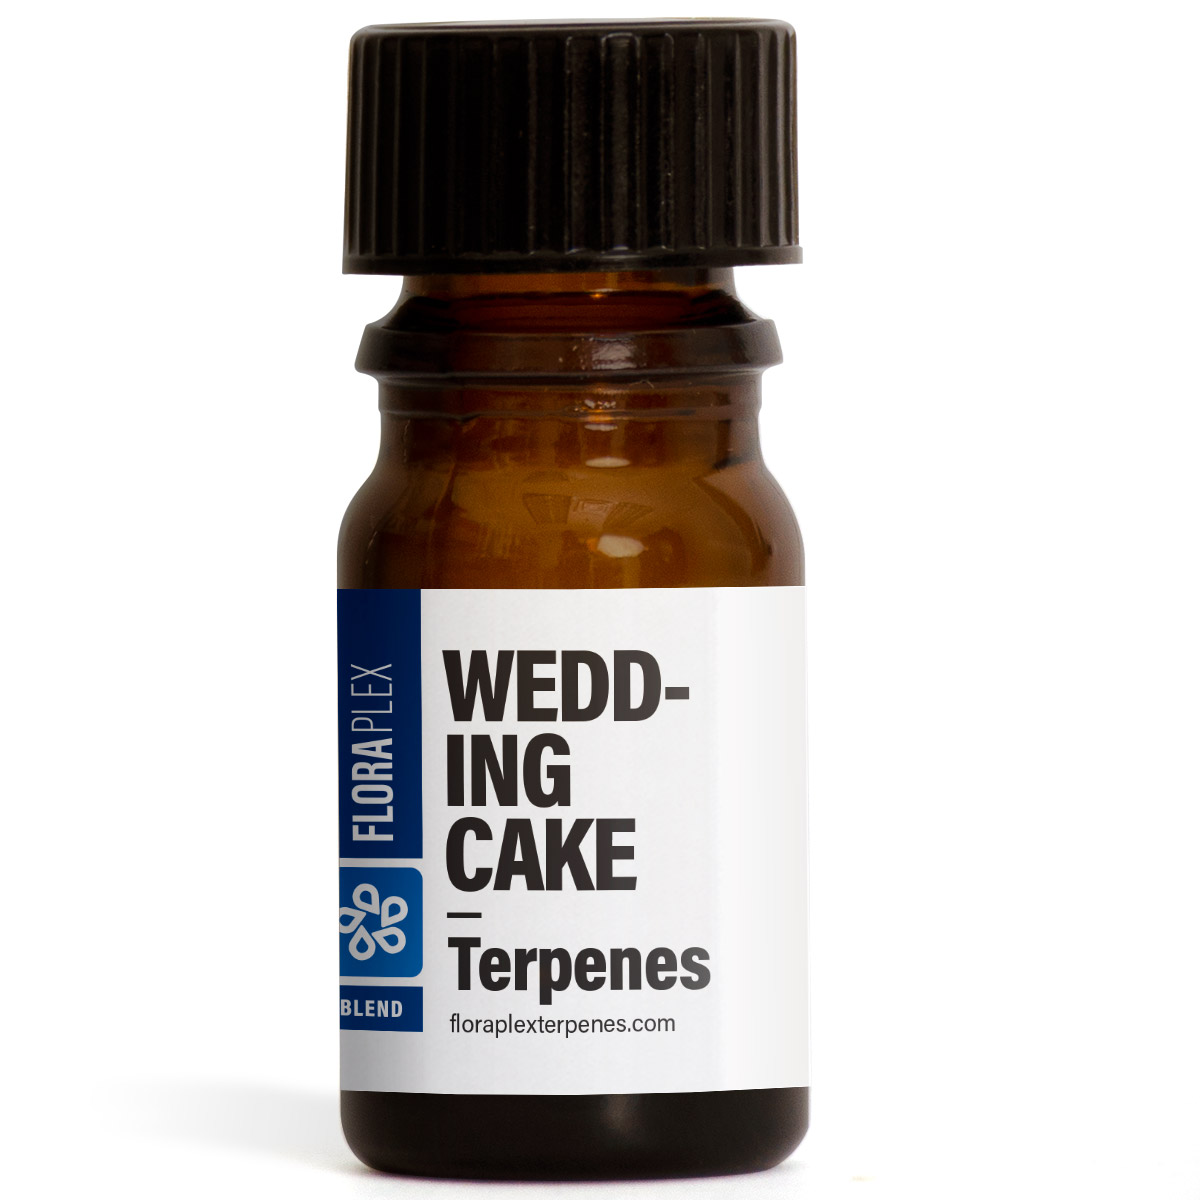 Wedding Cake Terpene Profile • Buy Terpenes Online • Floraplex Terpenes